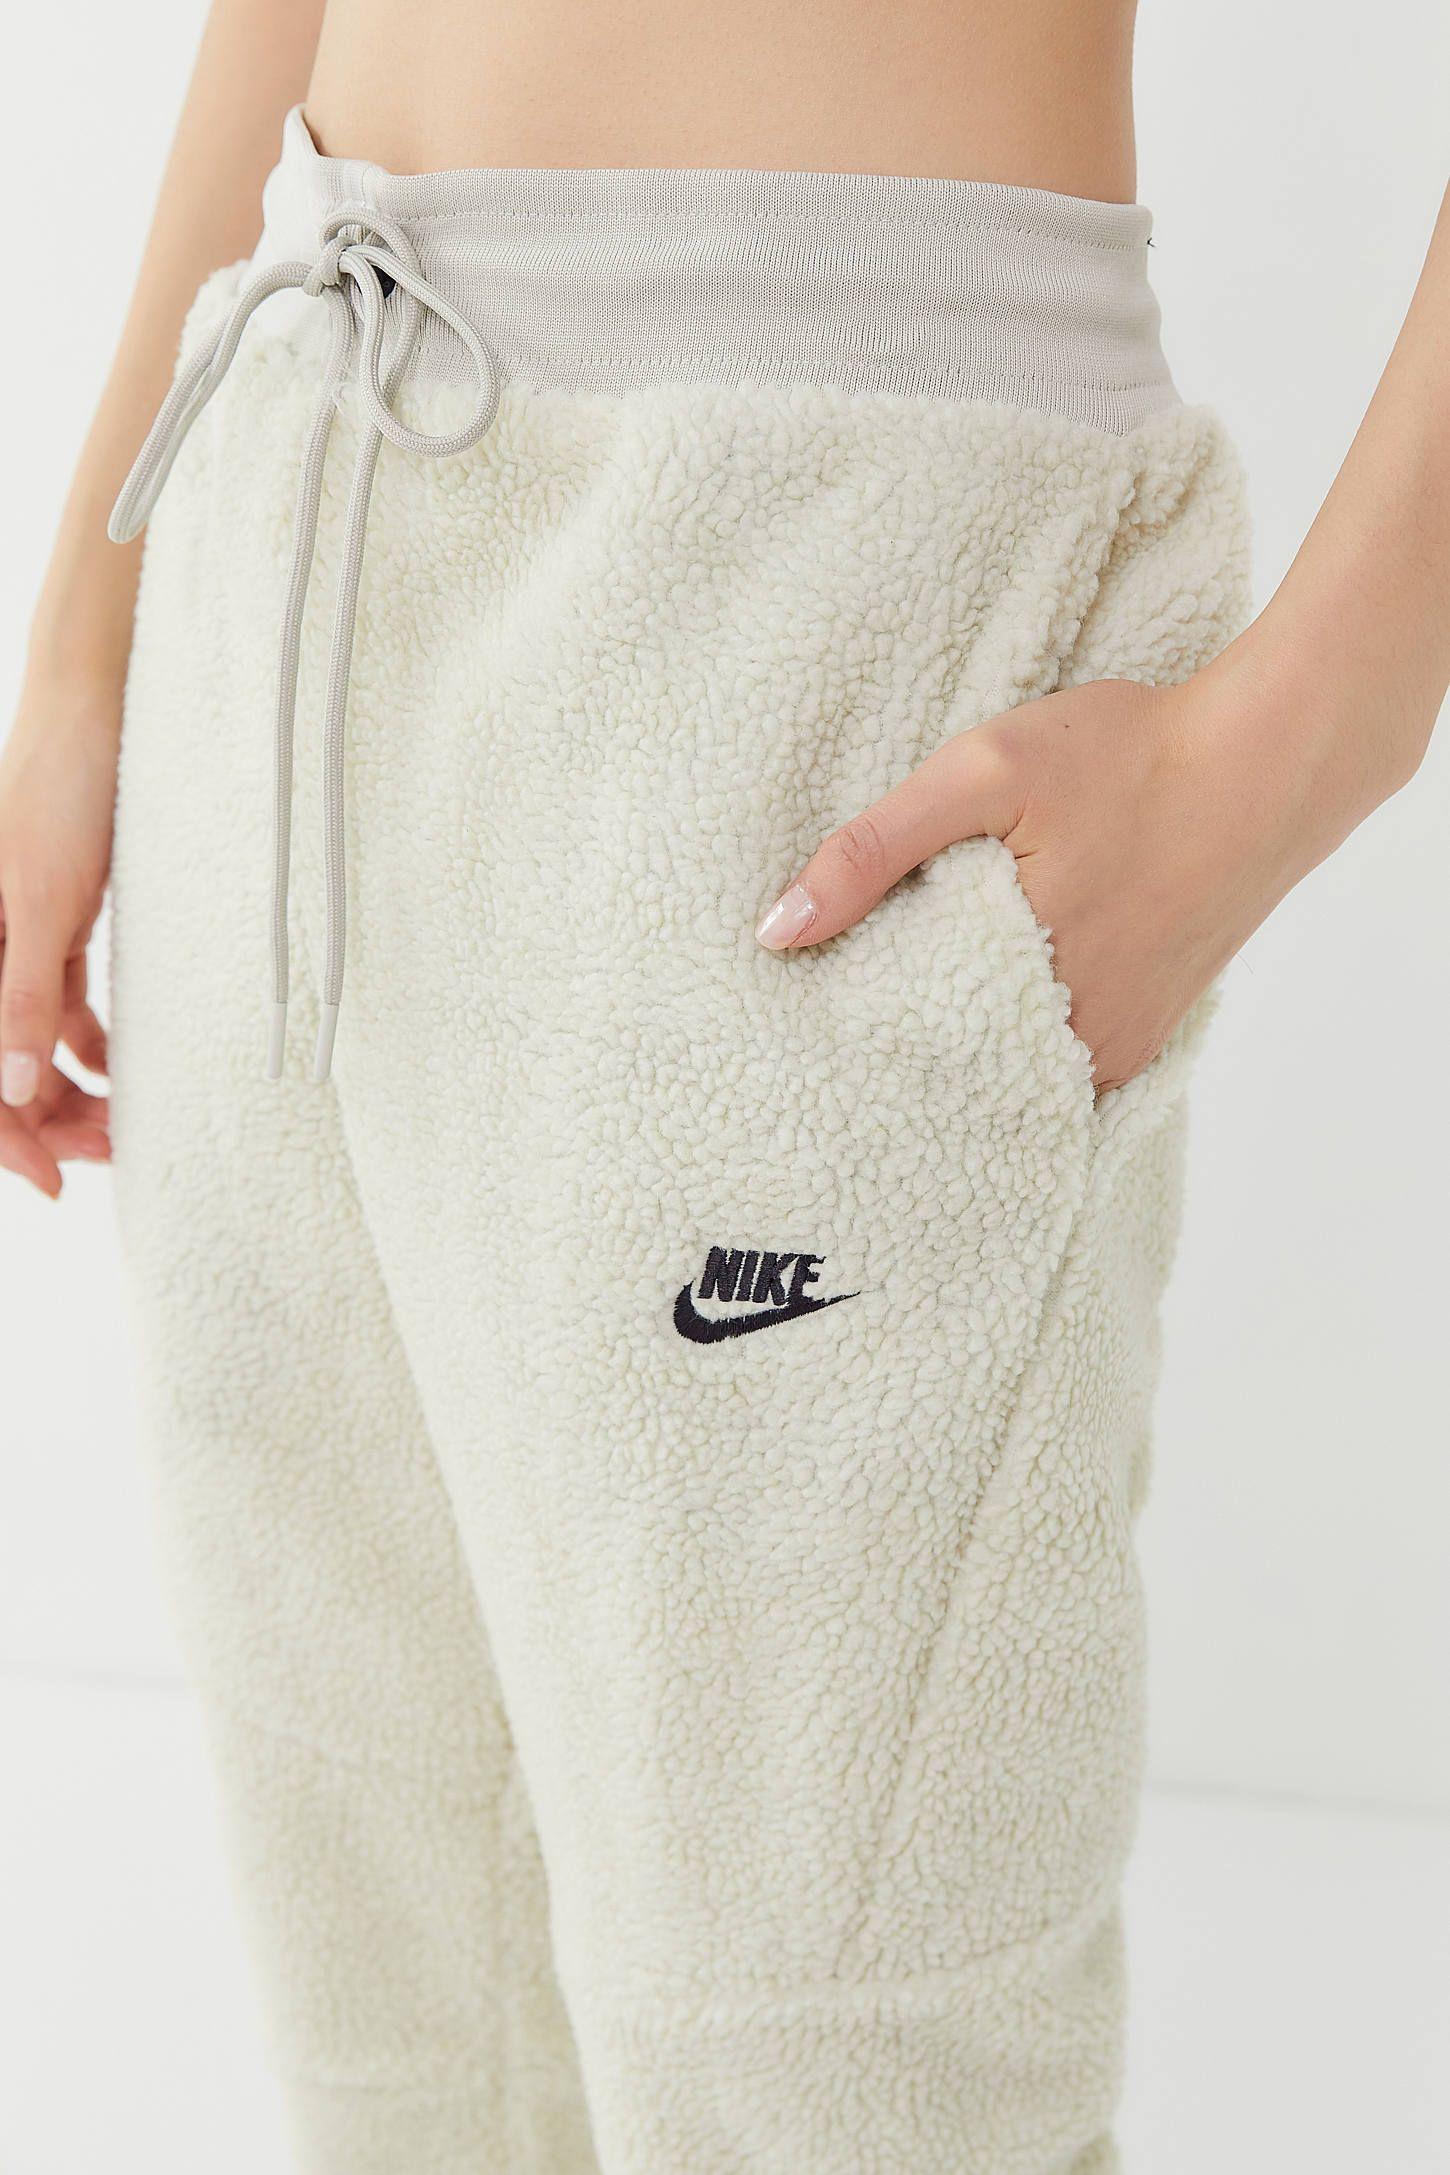 21f149e2 Nike Air Sherpa Fleece Jogger Pant in 2019 | Clothes I Want | Fleece ...